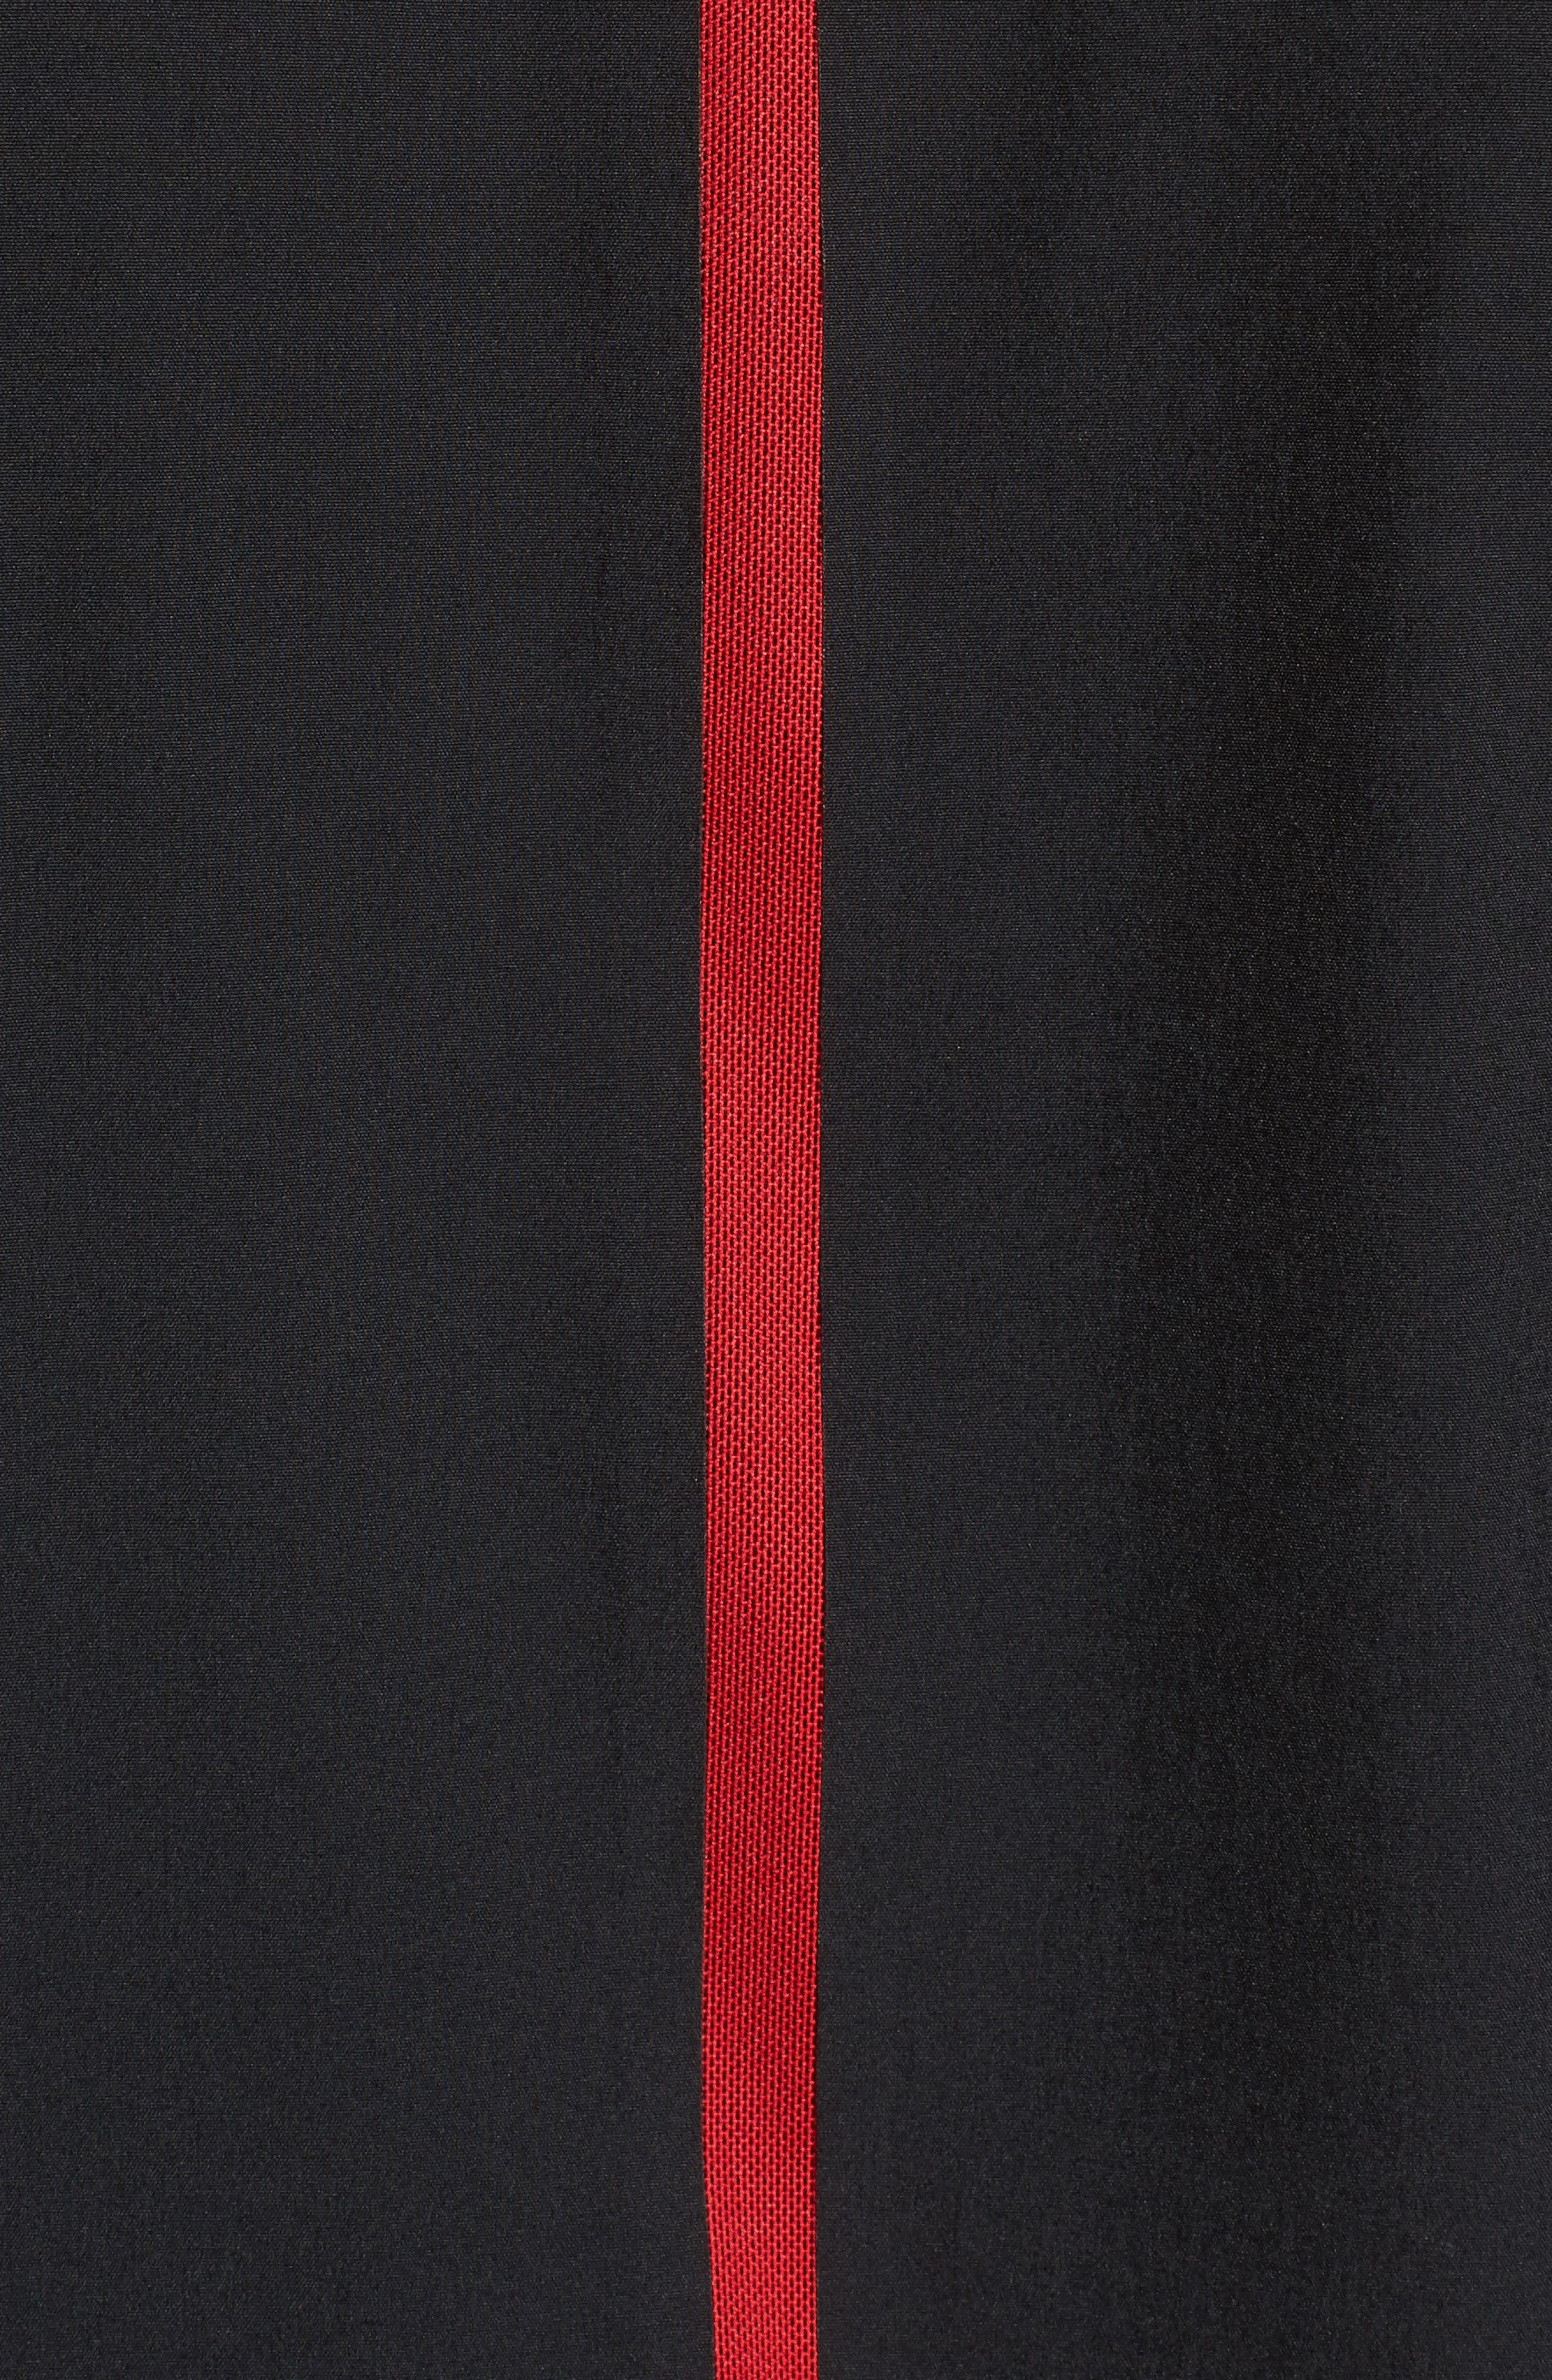 Ultimate Flight Zip Jacket,                             Alternate thumbnail 5, color,                             Black/ Gym Red